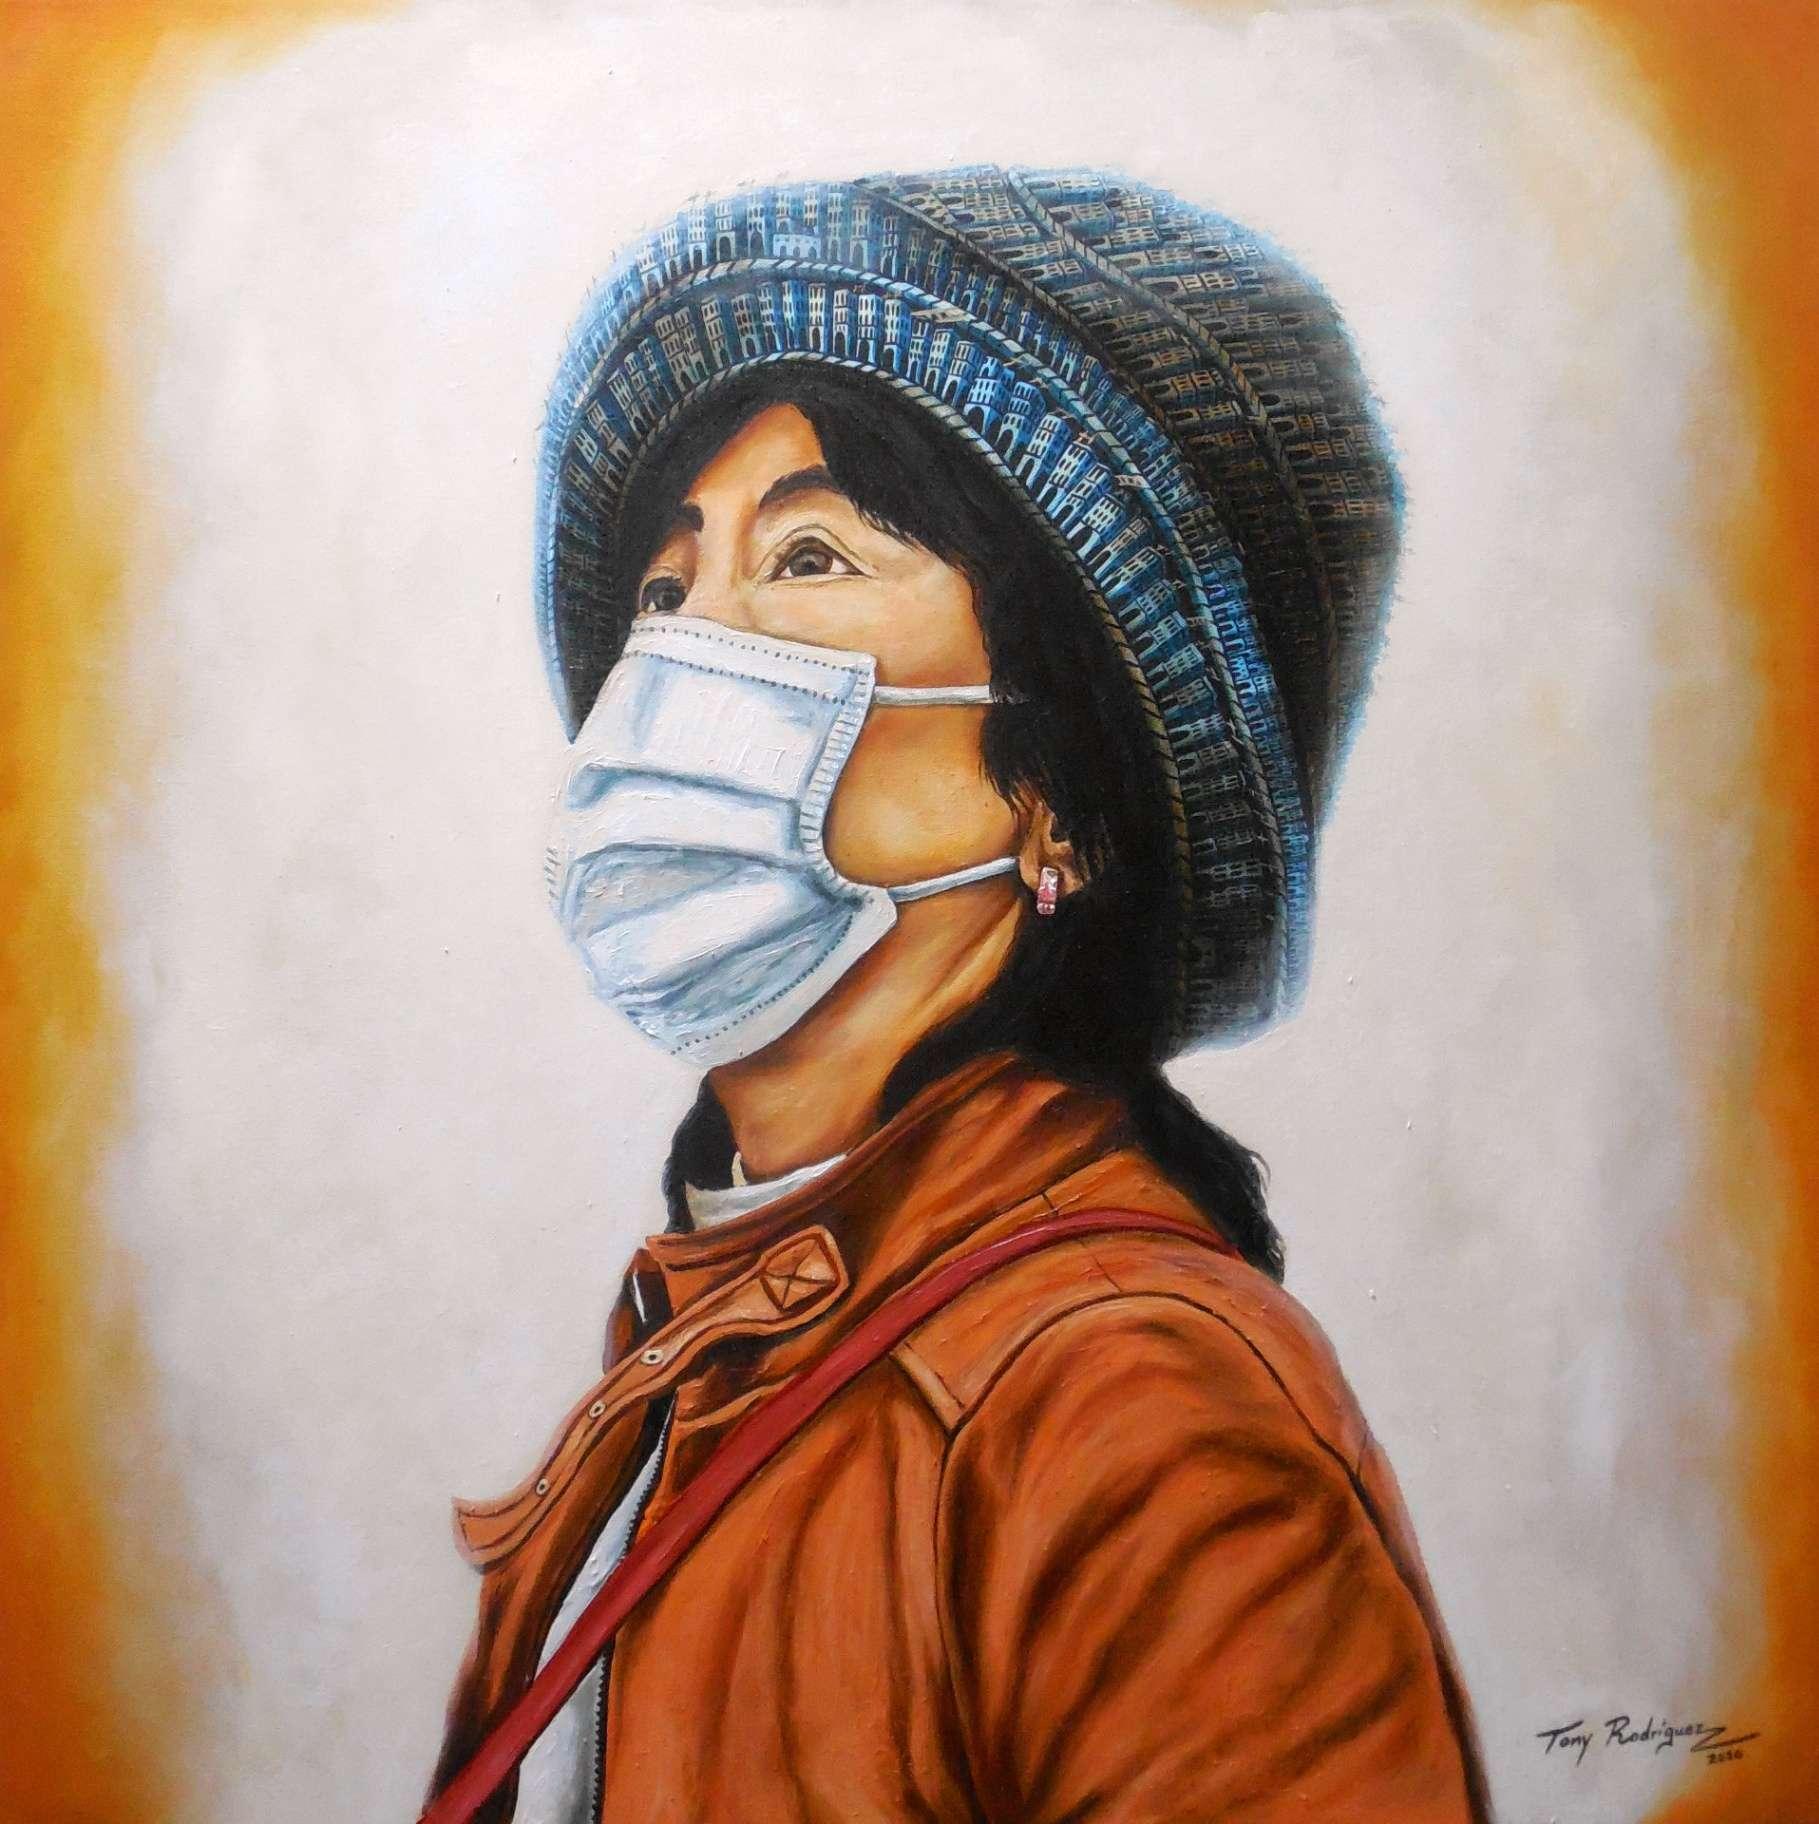 Obra: De la serie En tiempos de coronavirus...Esperanza